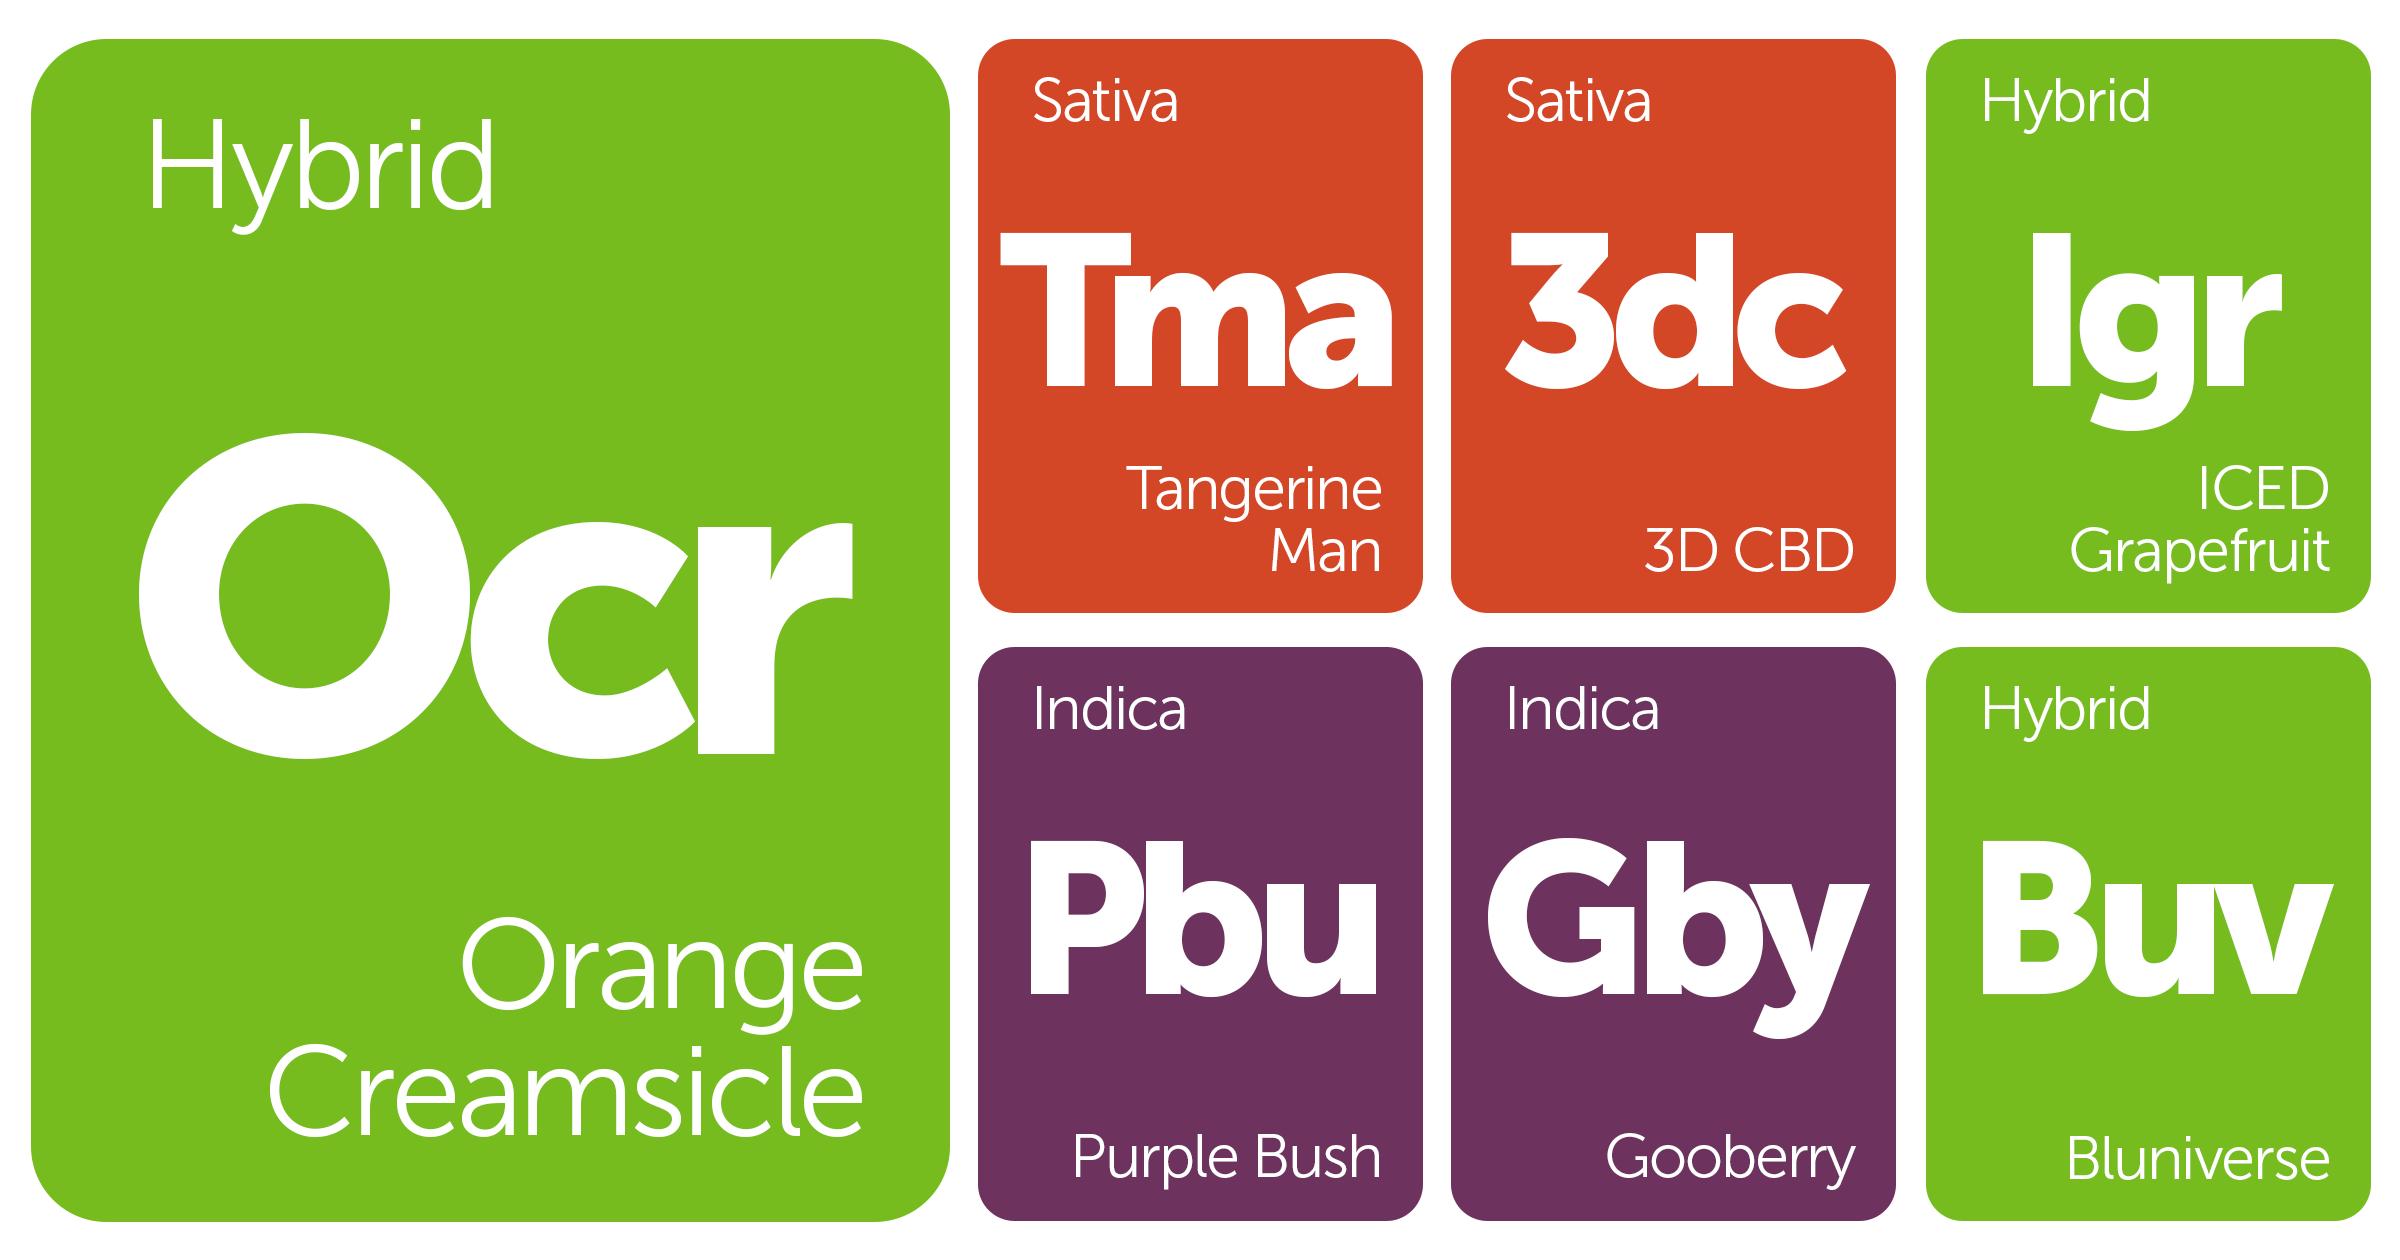 New Strains Alert: Orange Creamsicle, Bluniverse, ICED Grapefruit, 3D CBD, and More